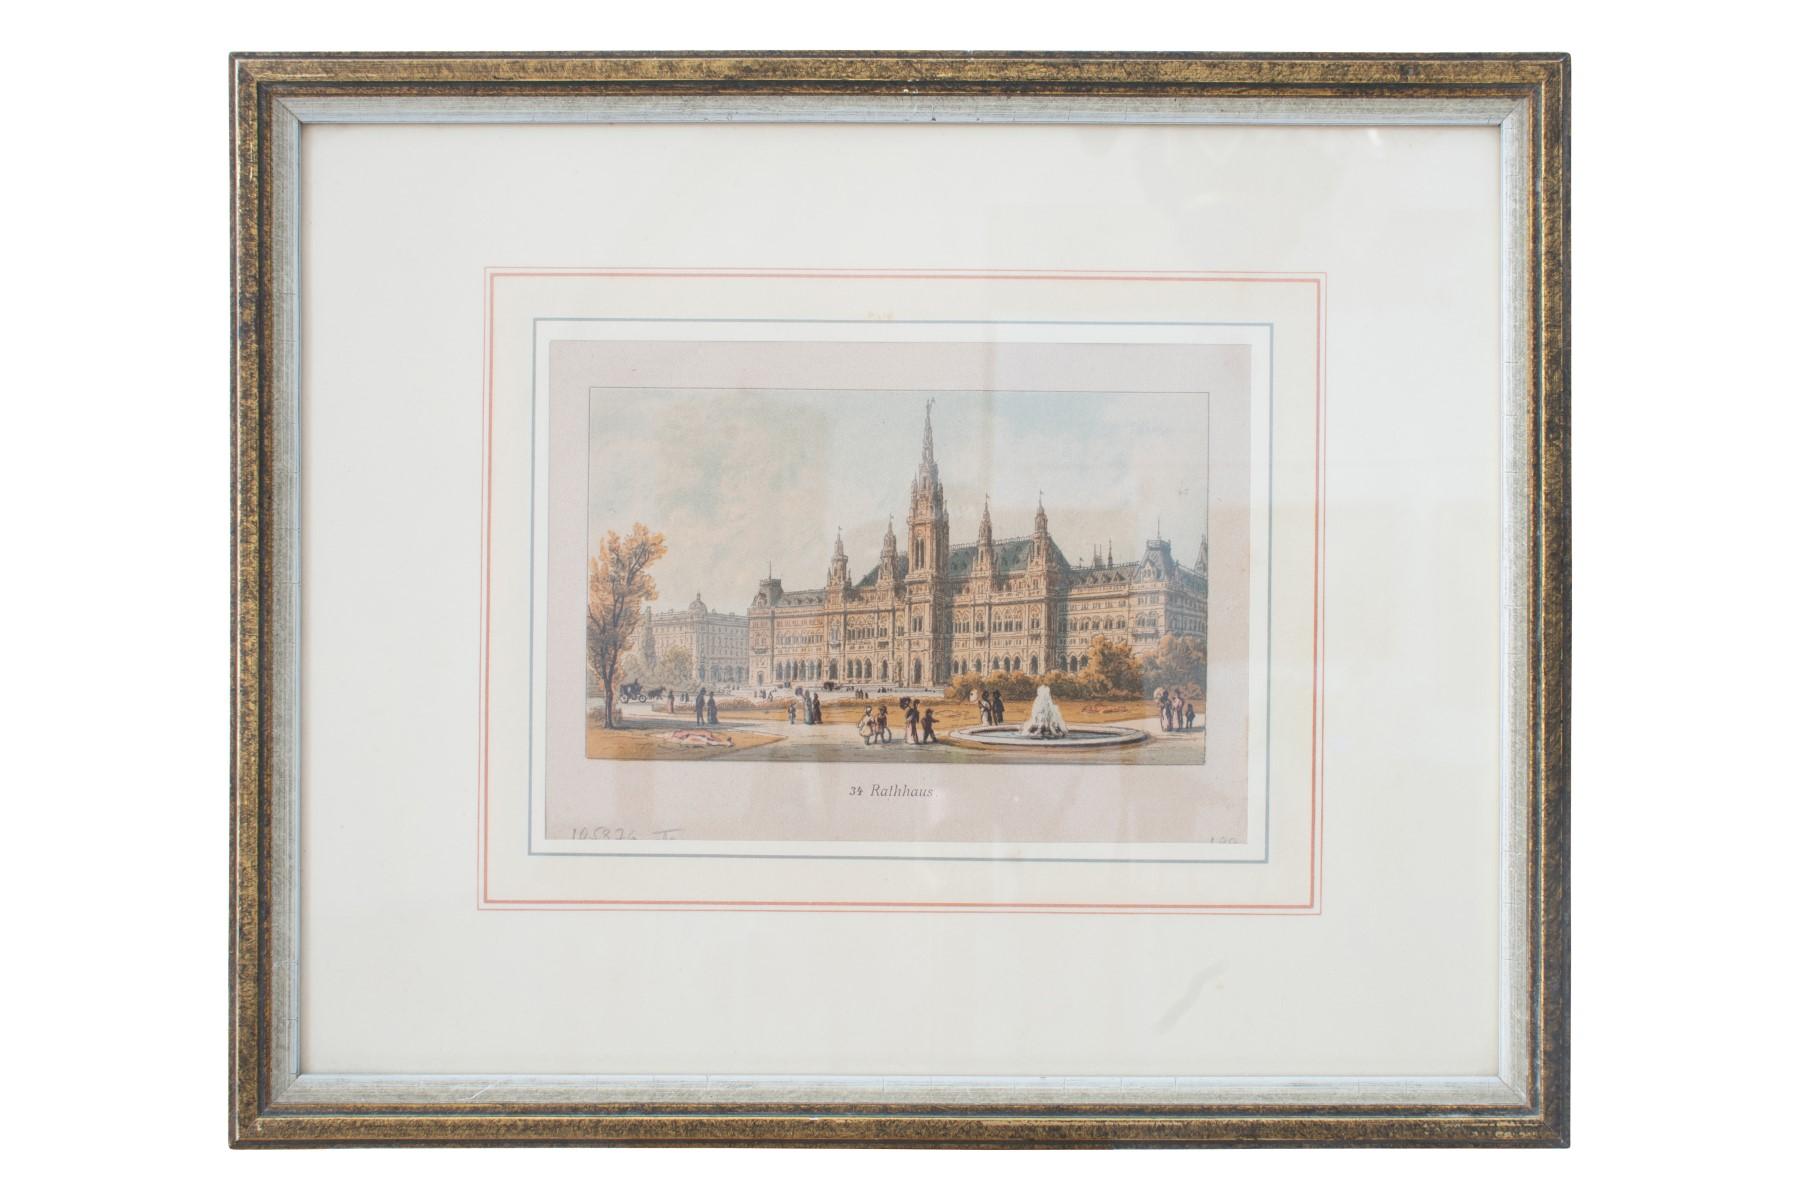 #35 Johann Varrone (1832-1910) and Eugen Ladislaus Petrovits (1839-1907), City Hall Vienna | Johann Varrone (1832-1910) und Eugen Ladislaus Petrovits (1839-1907), Rathaus Wien Image